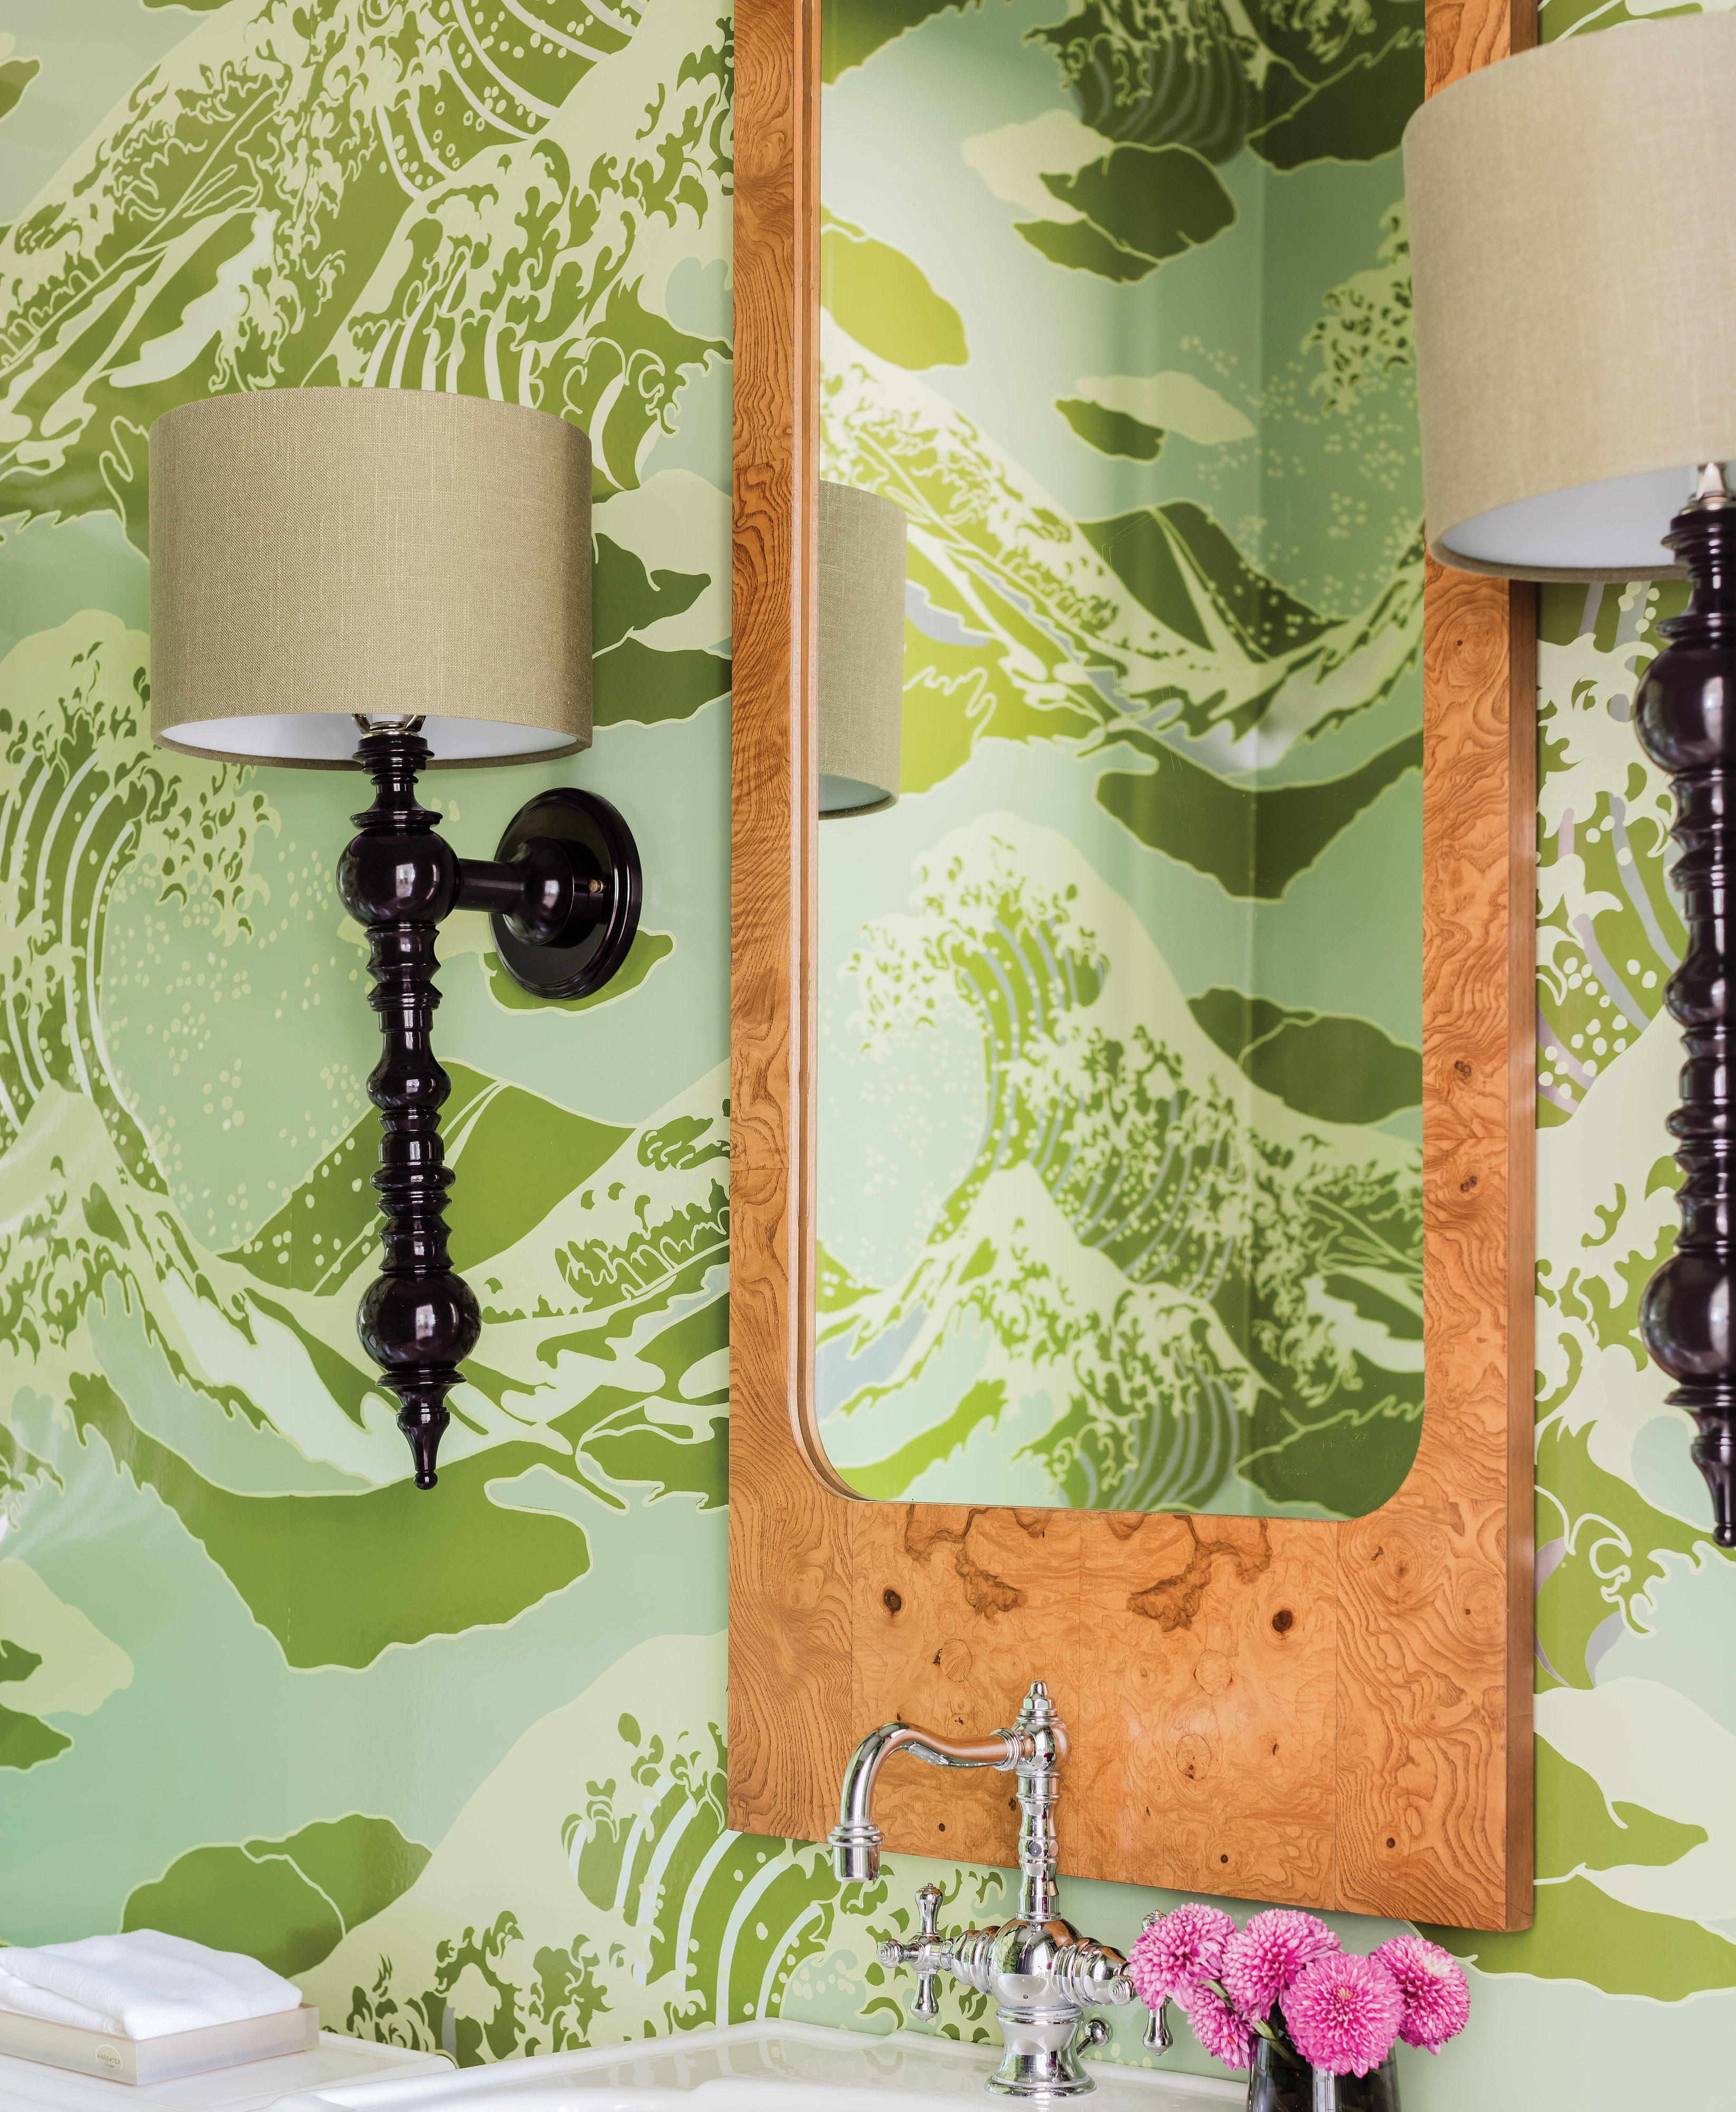 green scenic wallpaper print